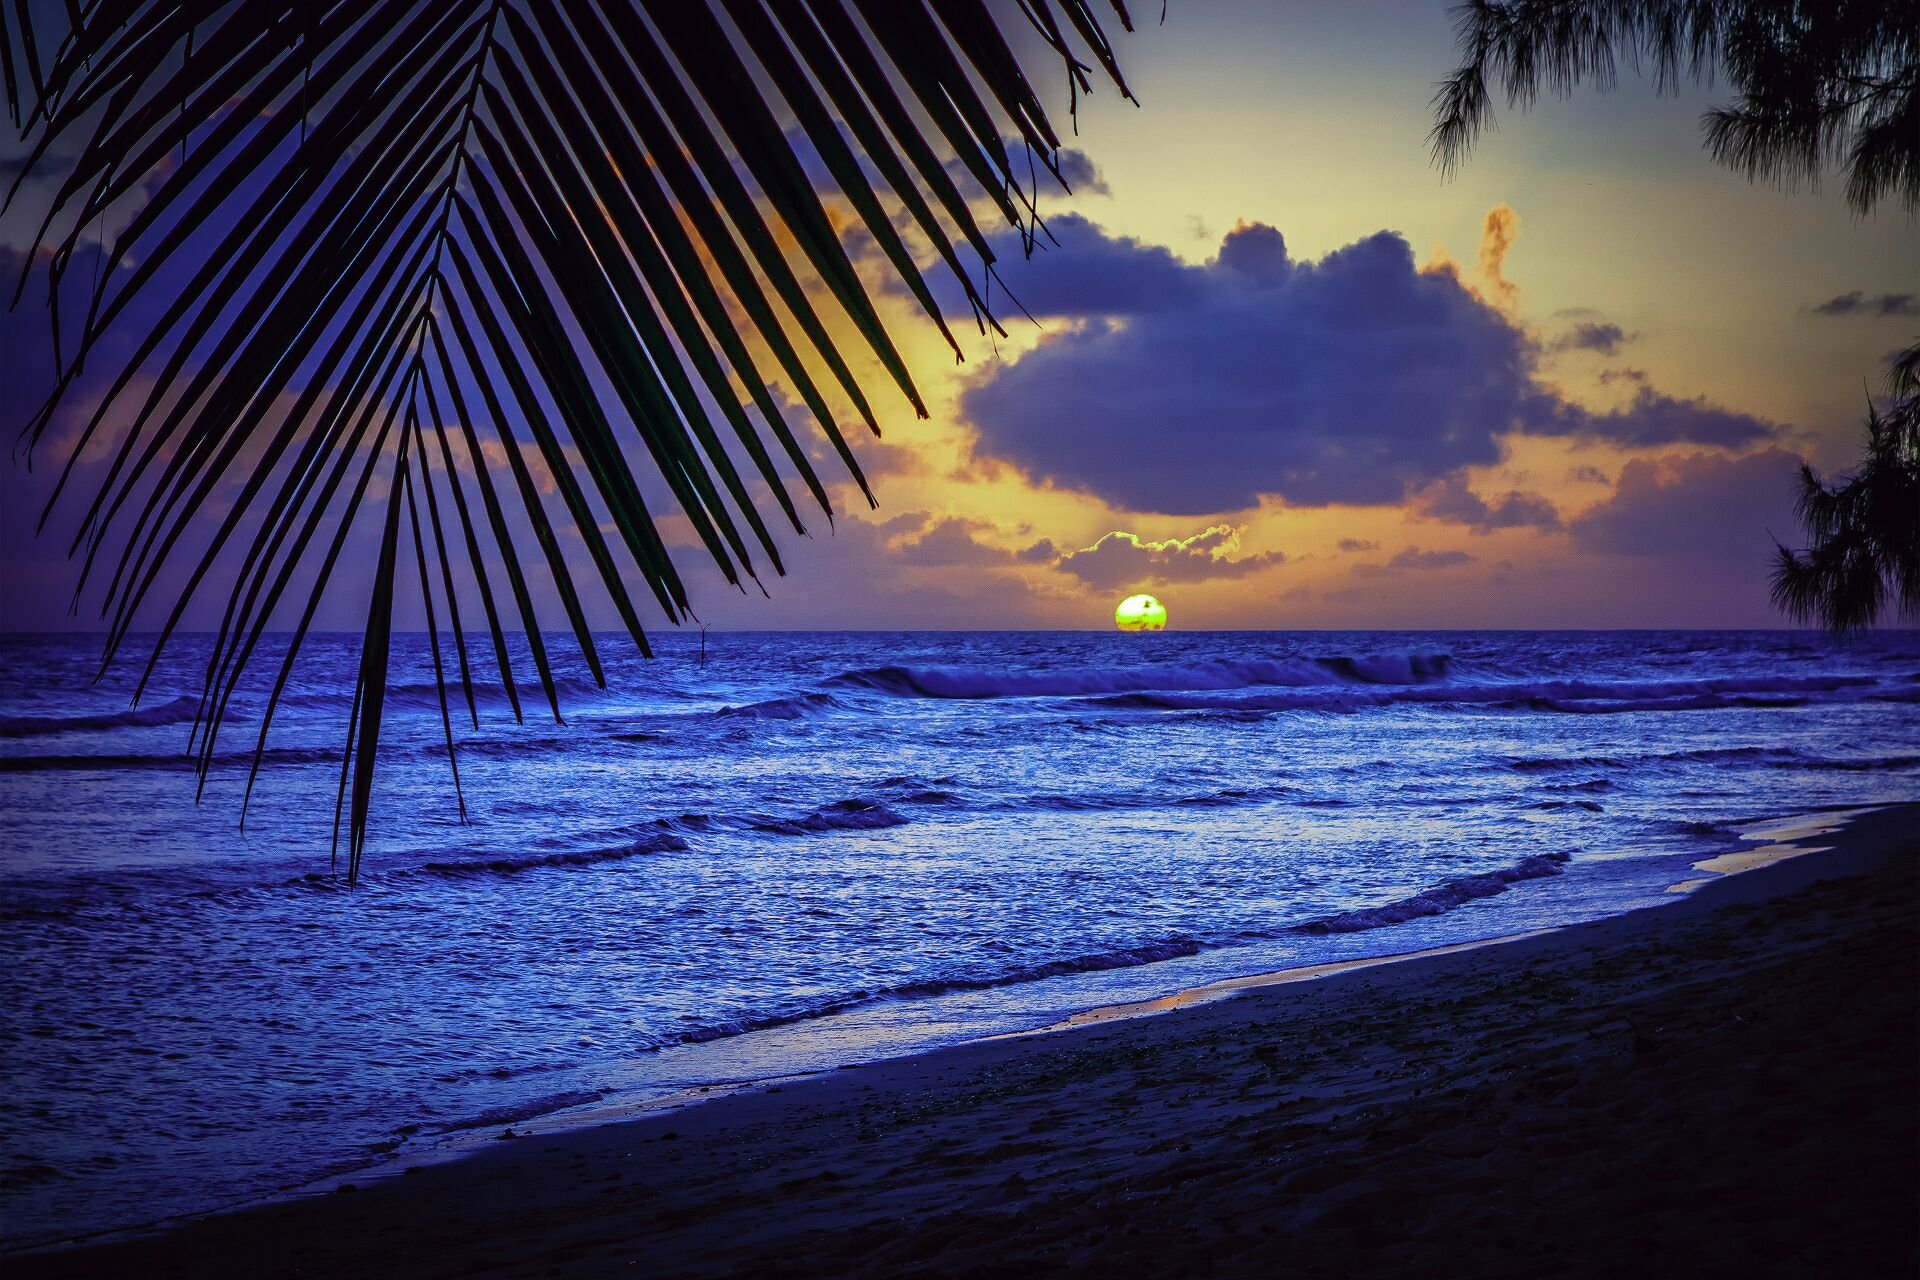 Caribbean Sunset Wallpaper Desktop - 511.3KB